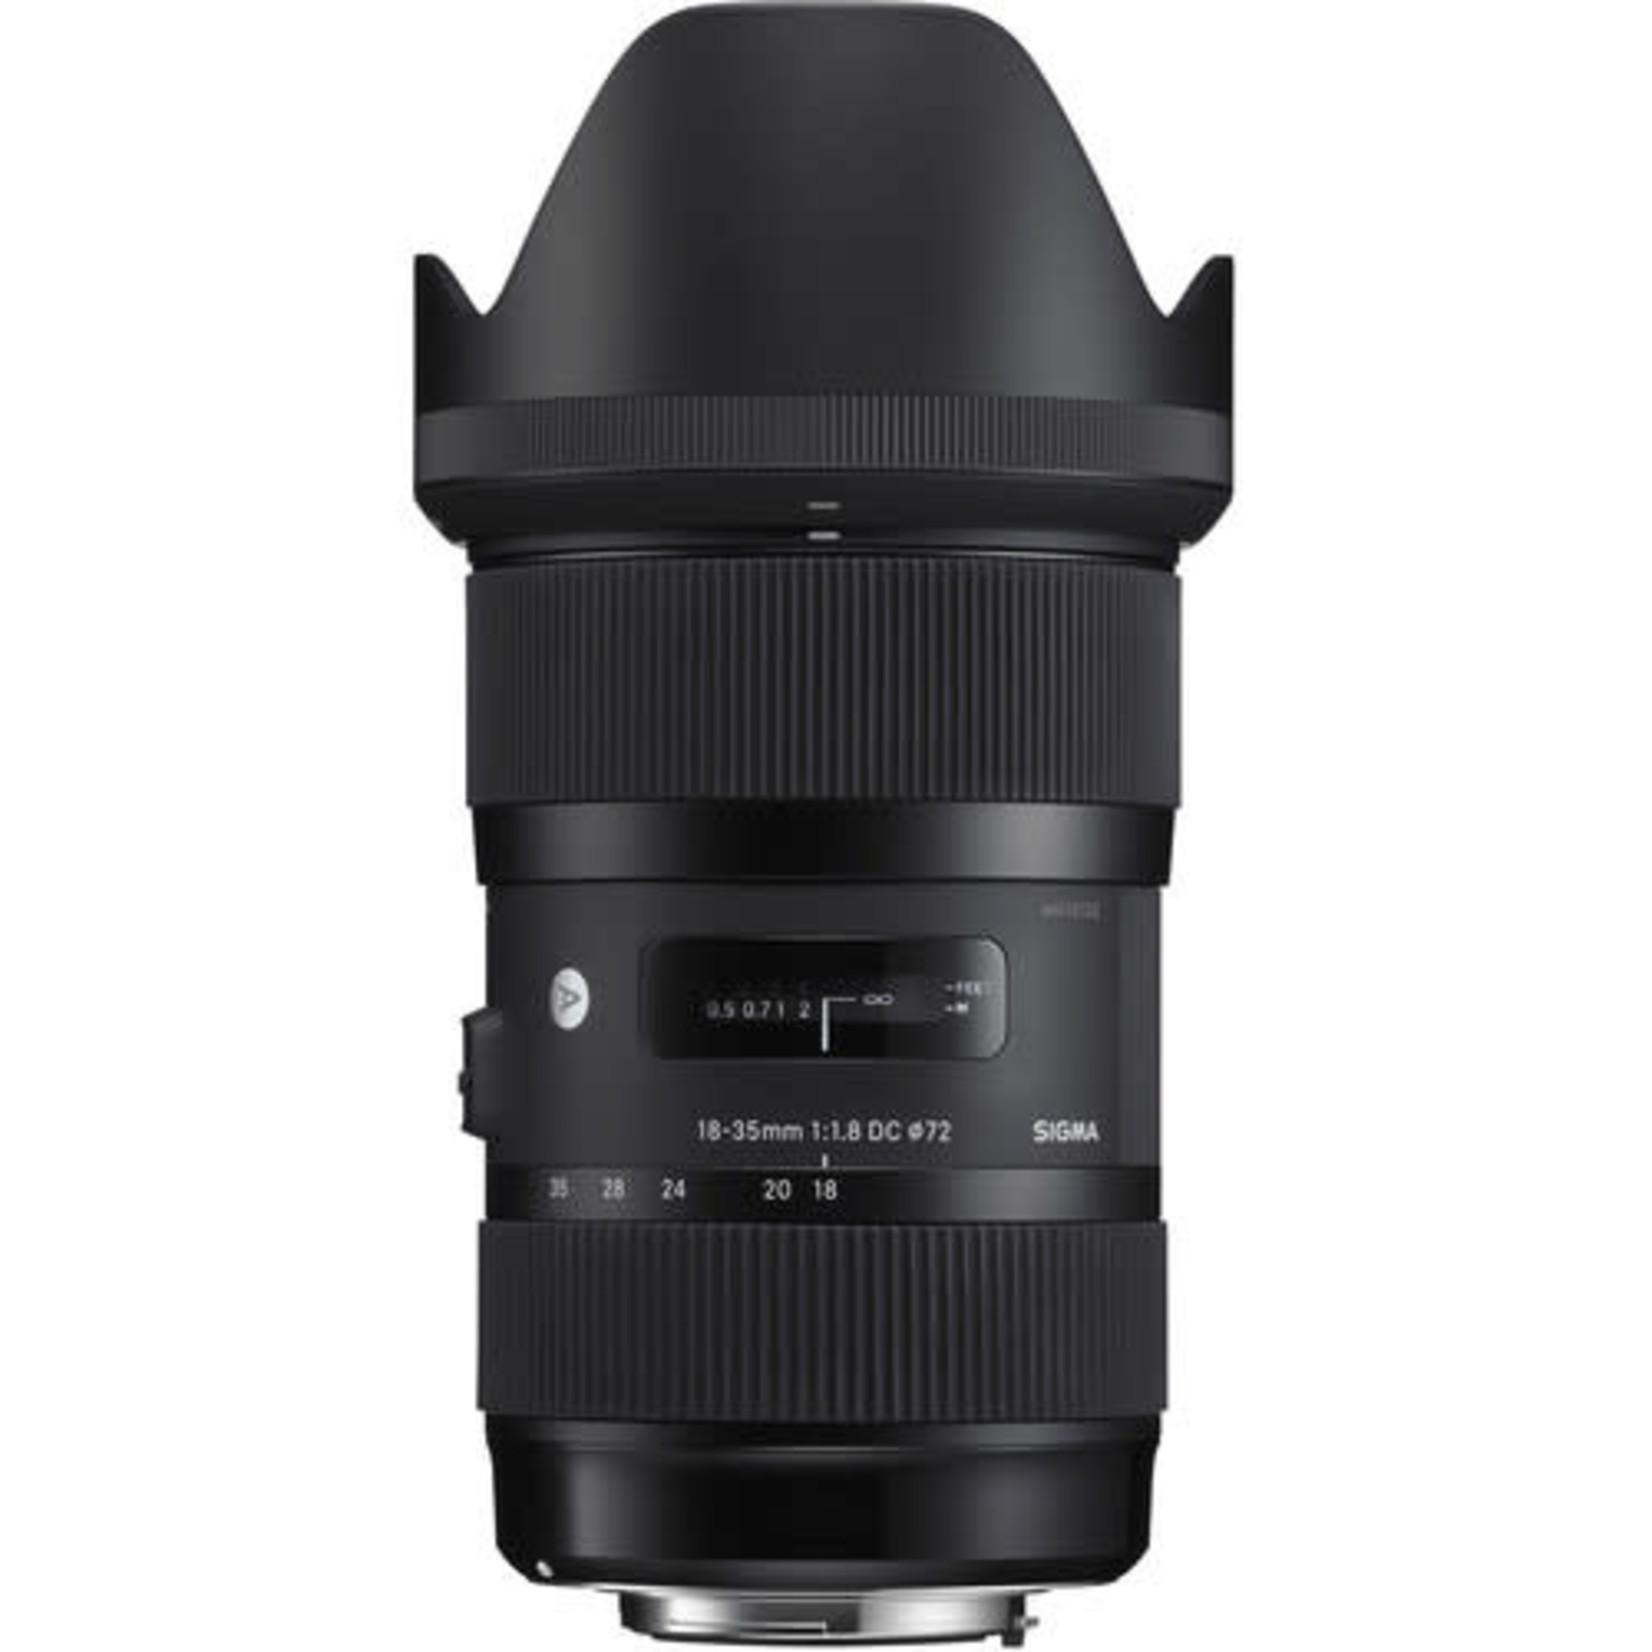 Sigma Sigma 18-35mm f/1.8 DC HSM Art Lens for Nikon F